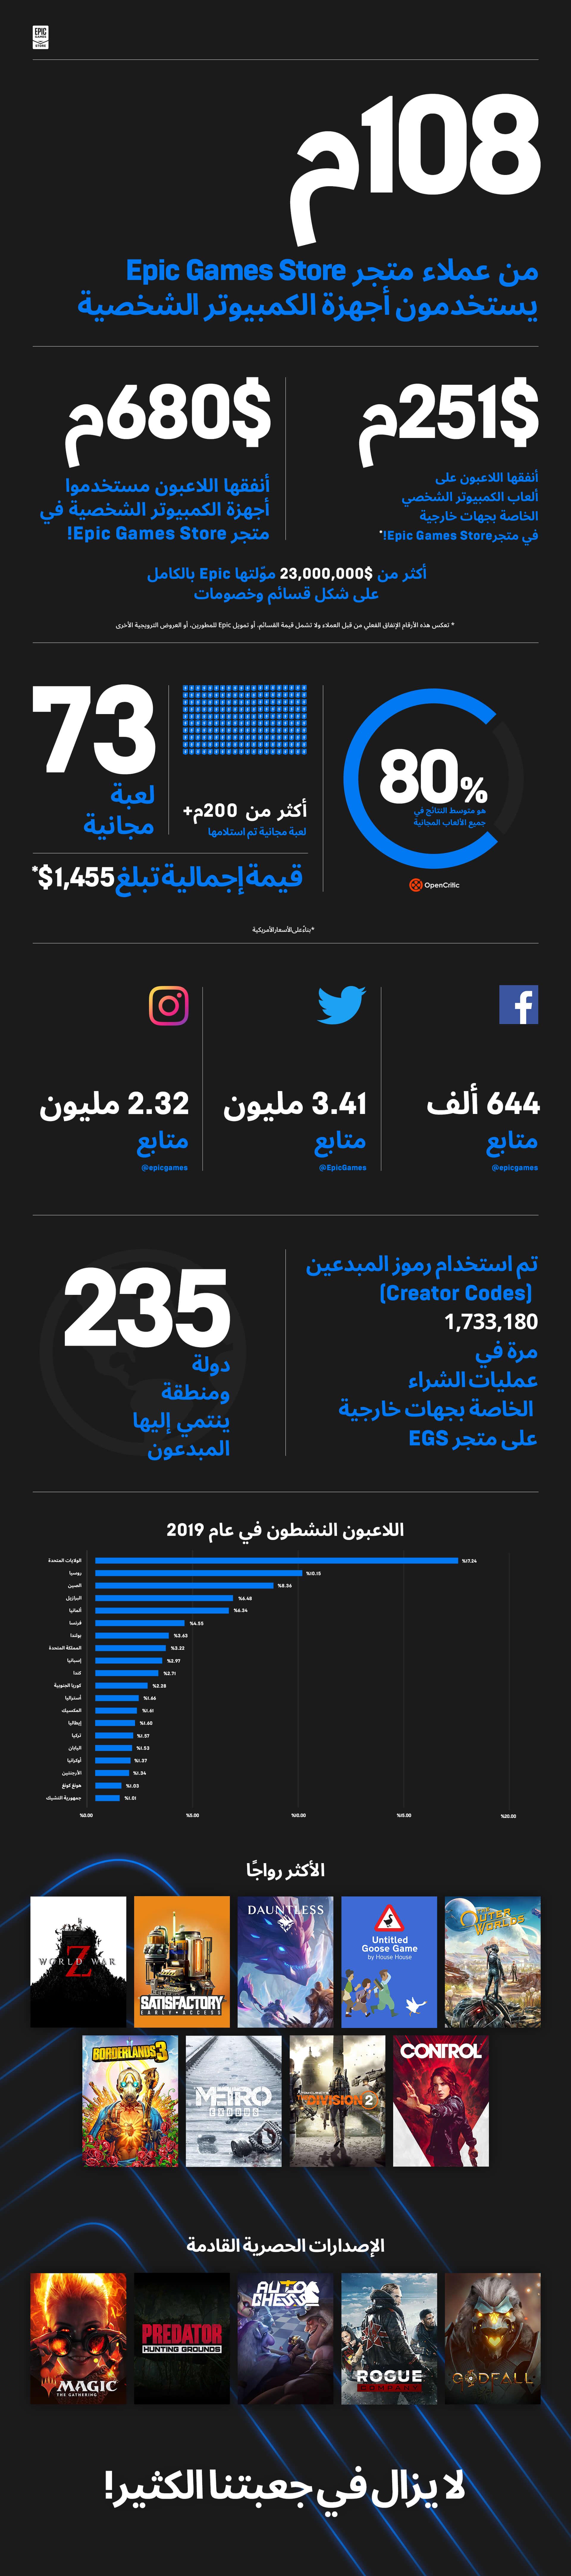 AR_EGS_Infographic.jpg